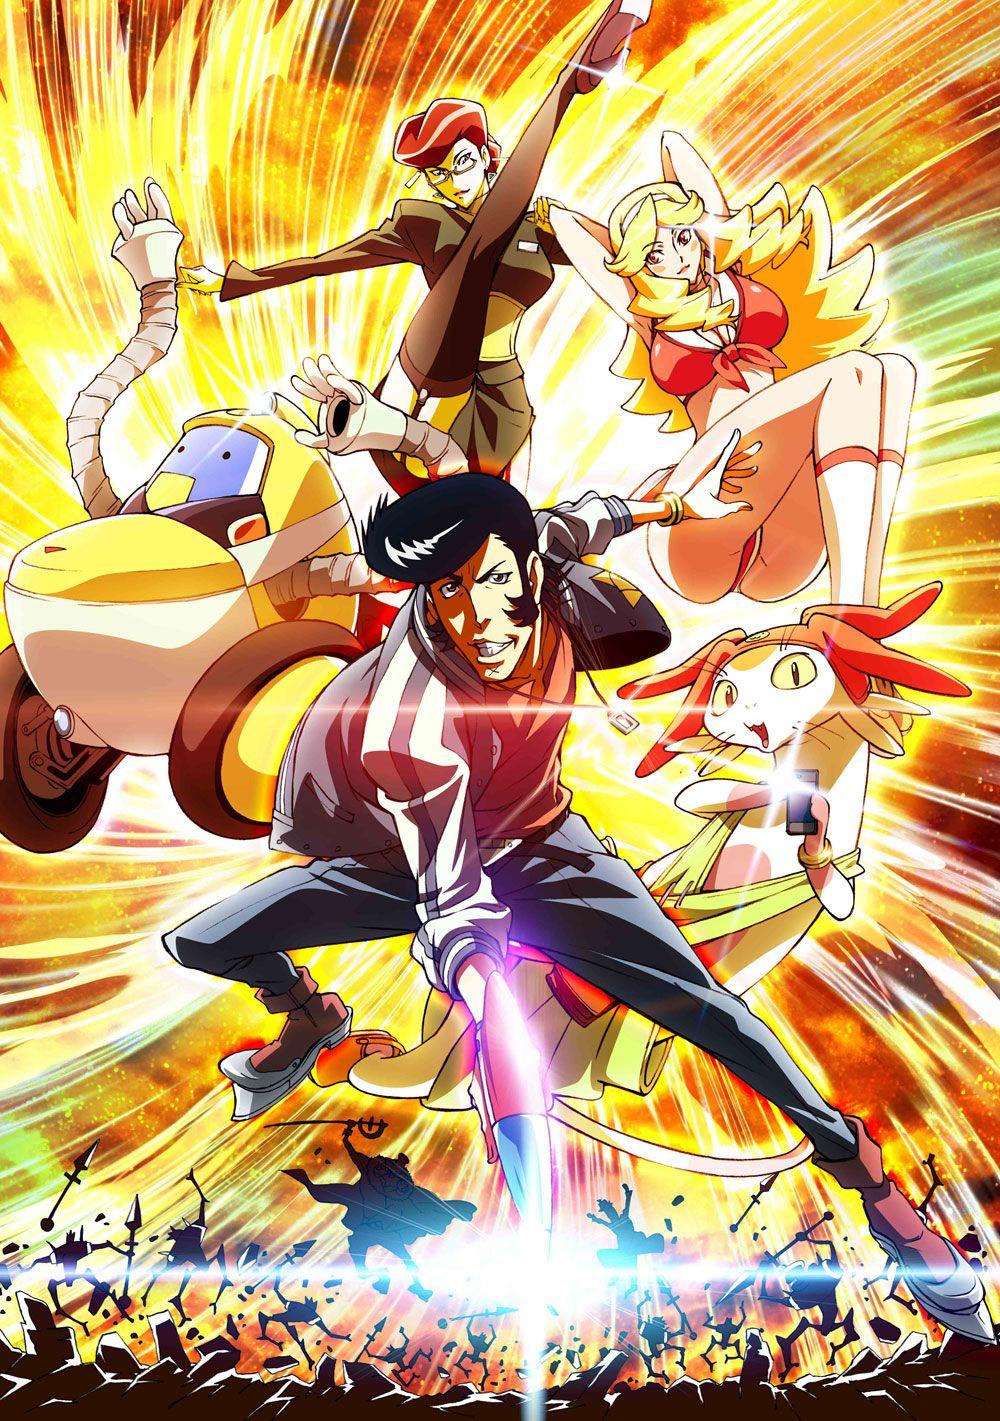 Space Dandy Key Visual Séries anime, Dandy, Anime